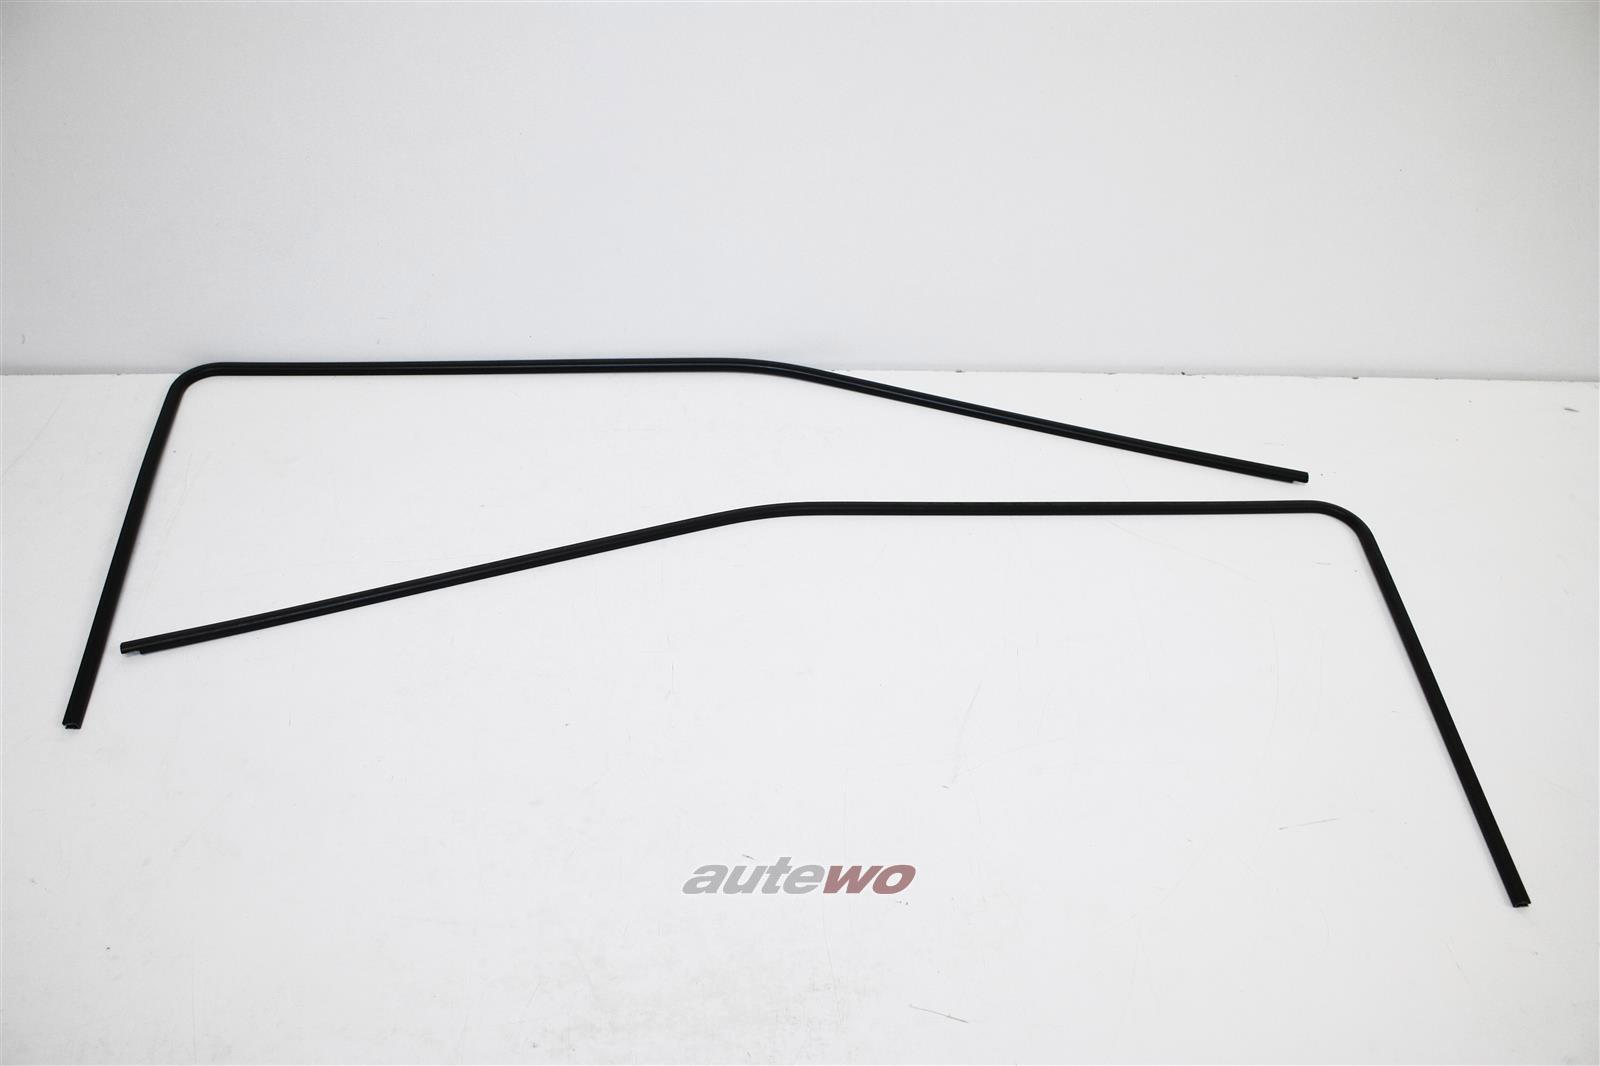 855837437 & 855837438 NEU Audi Coupe/Urquattro 81/85 Kantenschutz Fenster negro